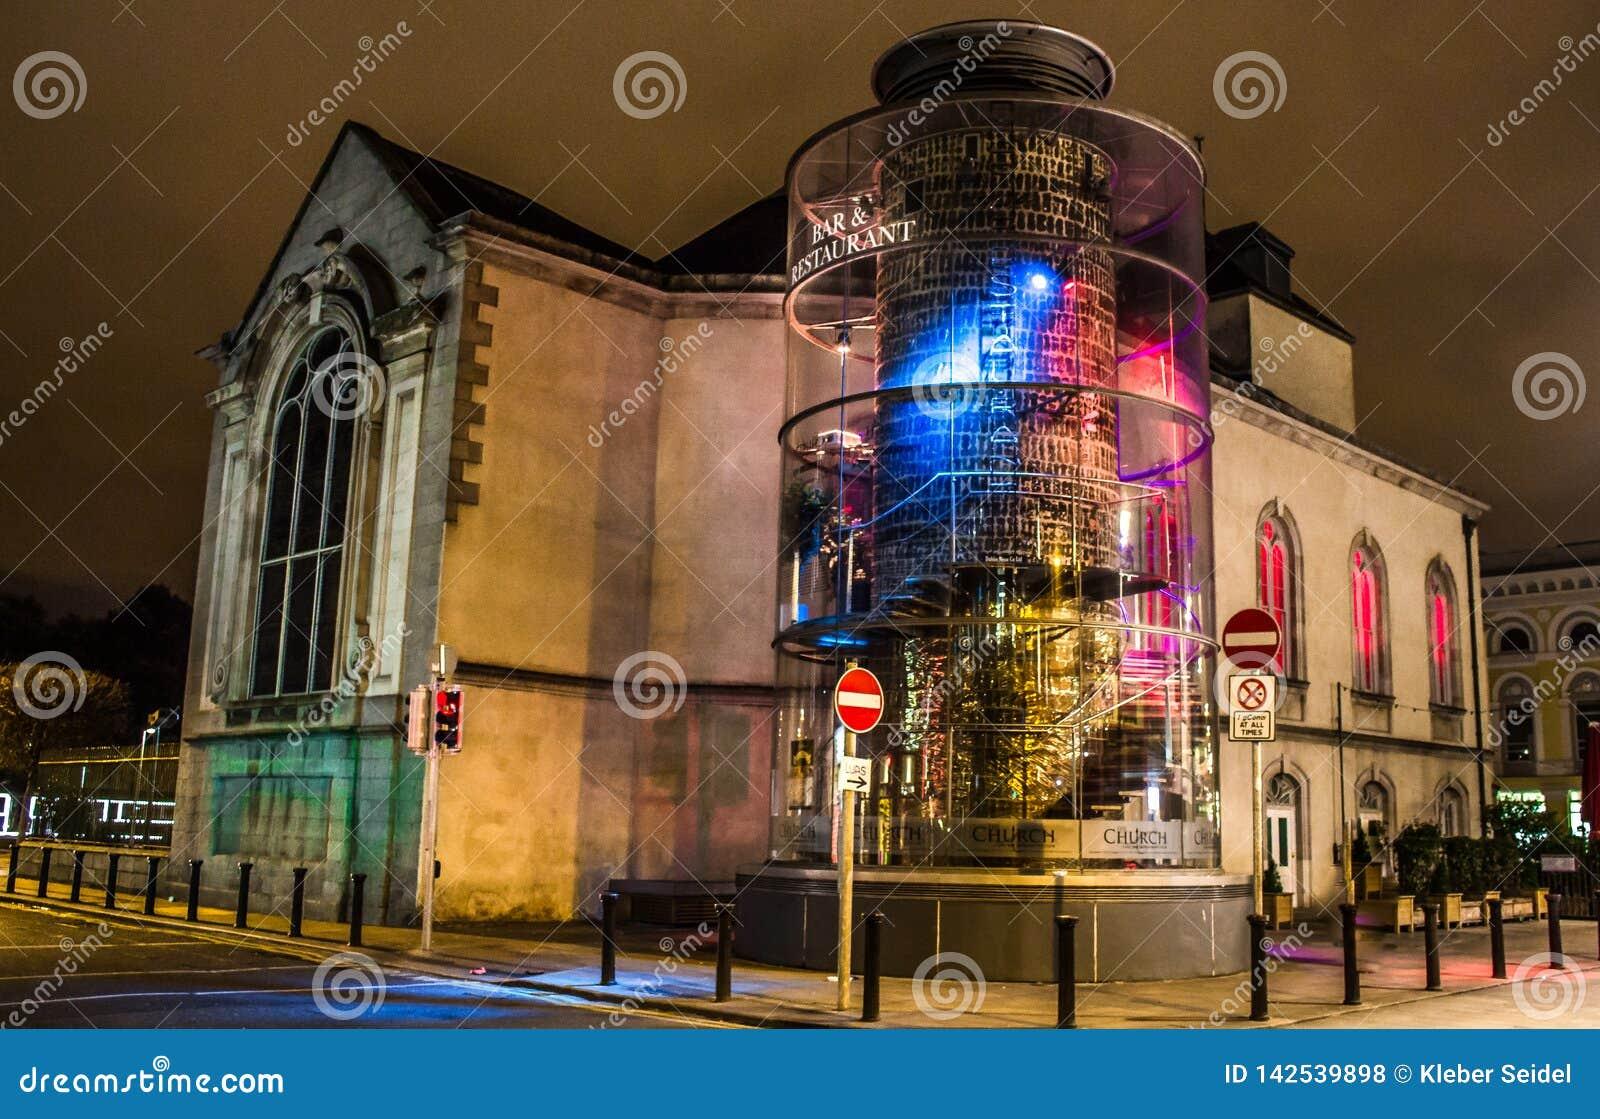 DUBLIN, IRELAND - FEBRUARY 17, 2017: The Chuch Bar and Restaurant at night. Located in the heart of Dublin